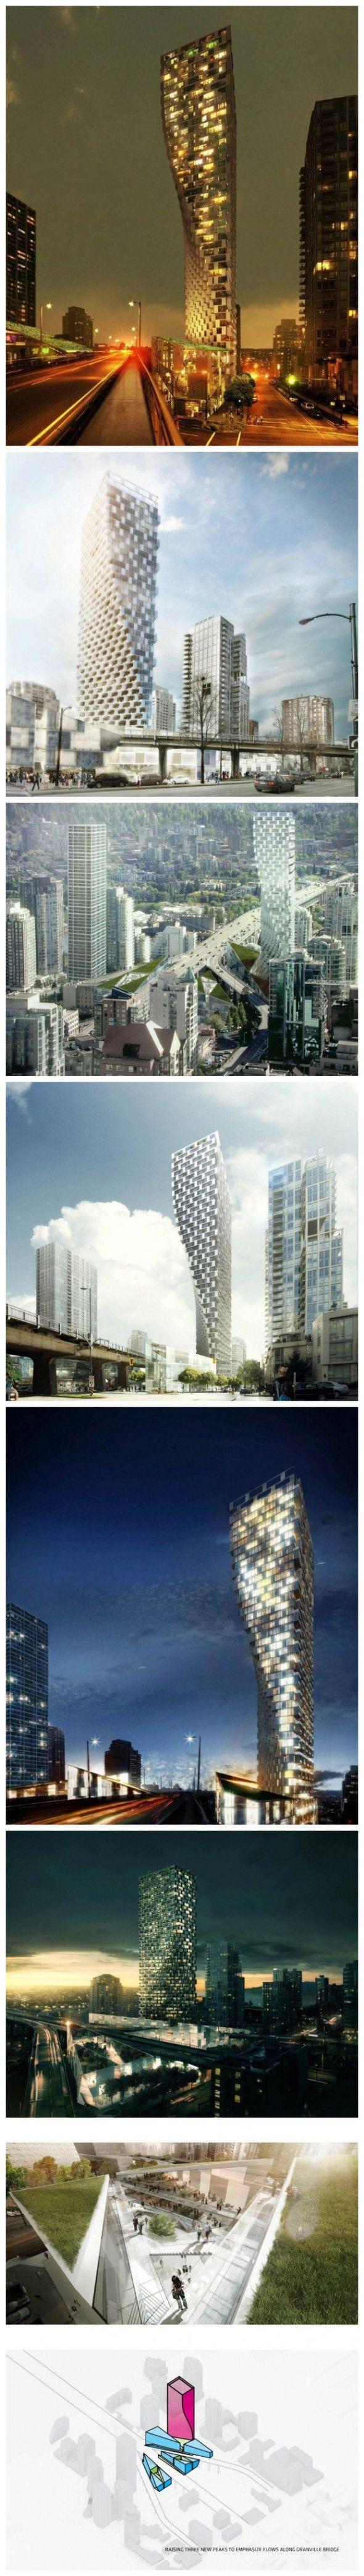 designed by Bjarke Ingels